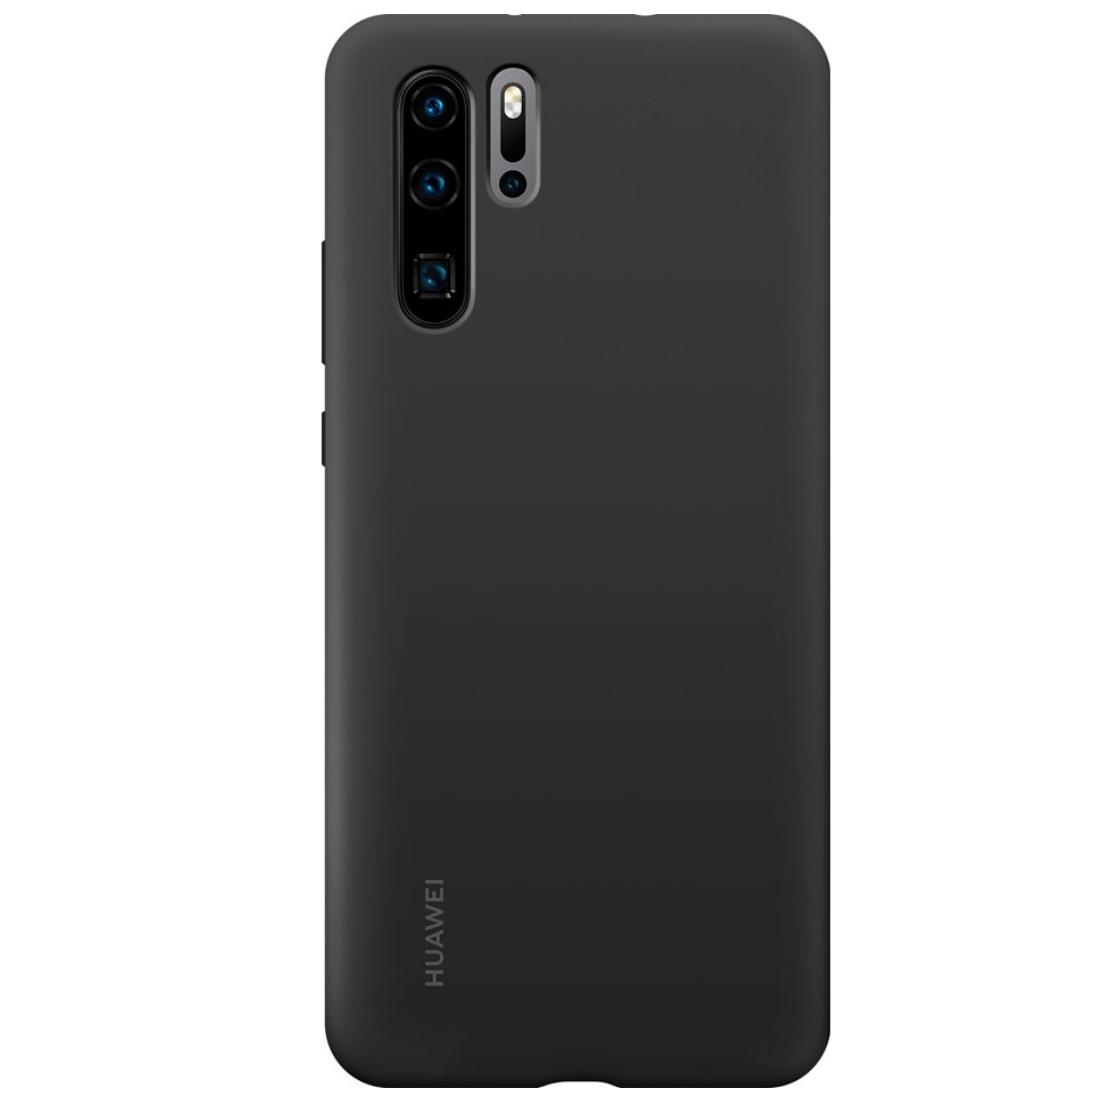 Capac protectie spate Huawei Silicone Cover pentru Huawei P30 Pro Black